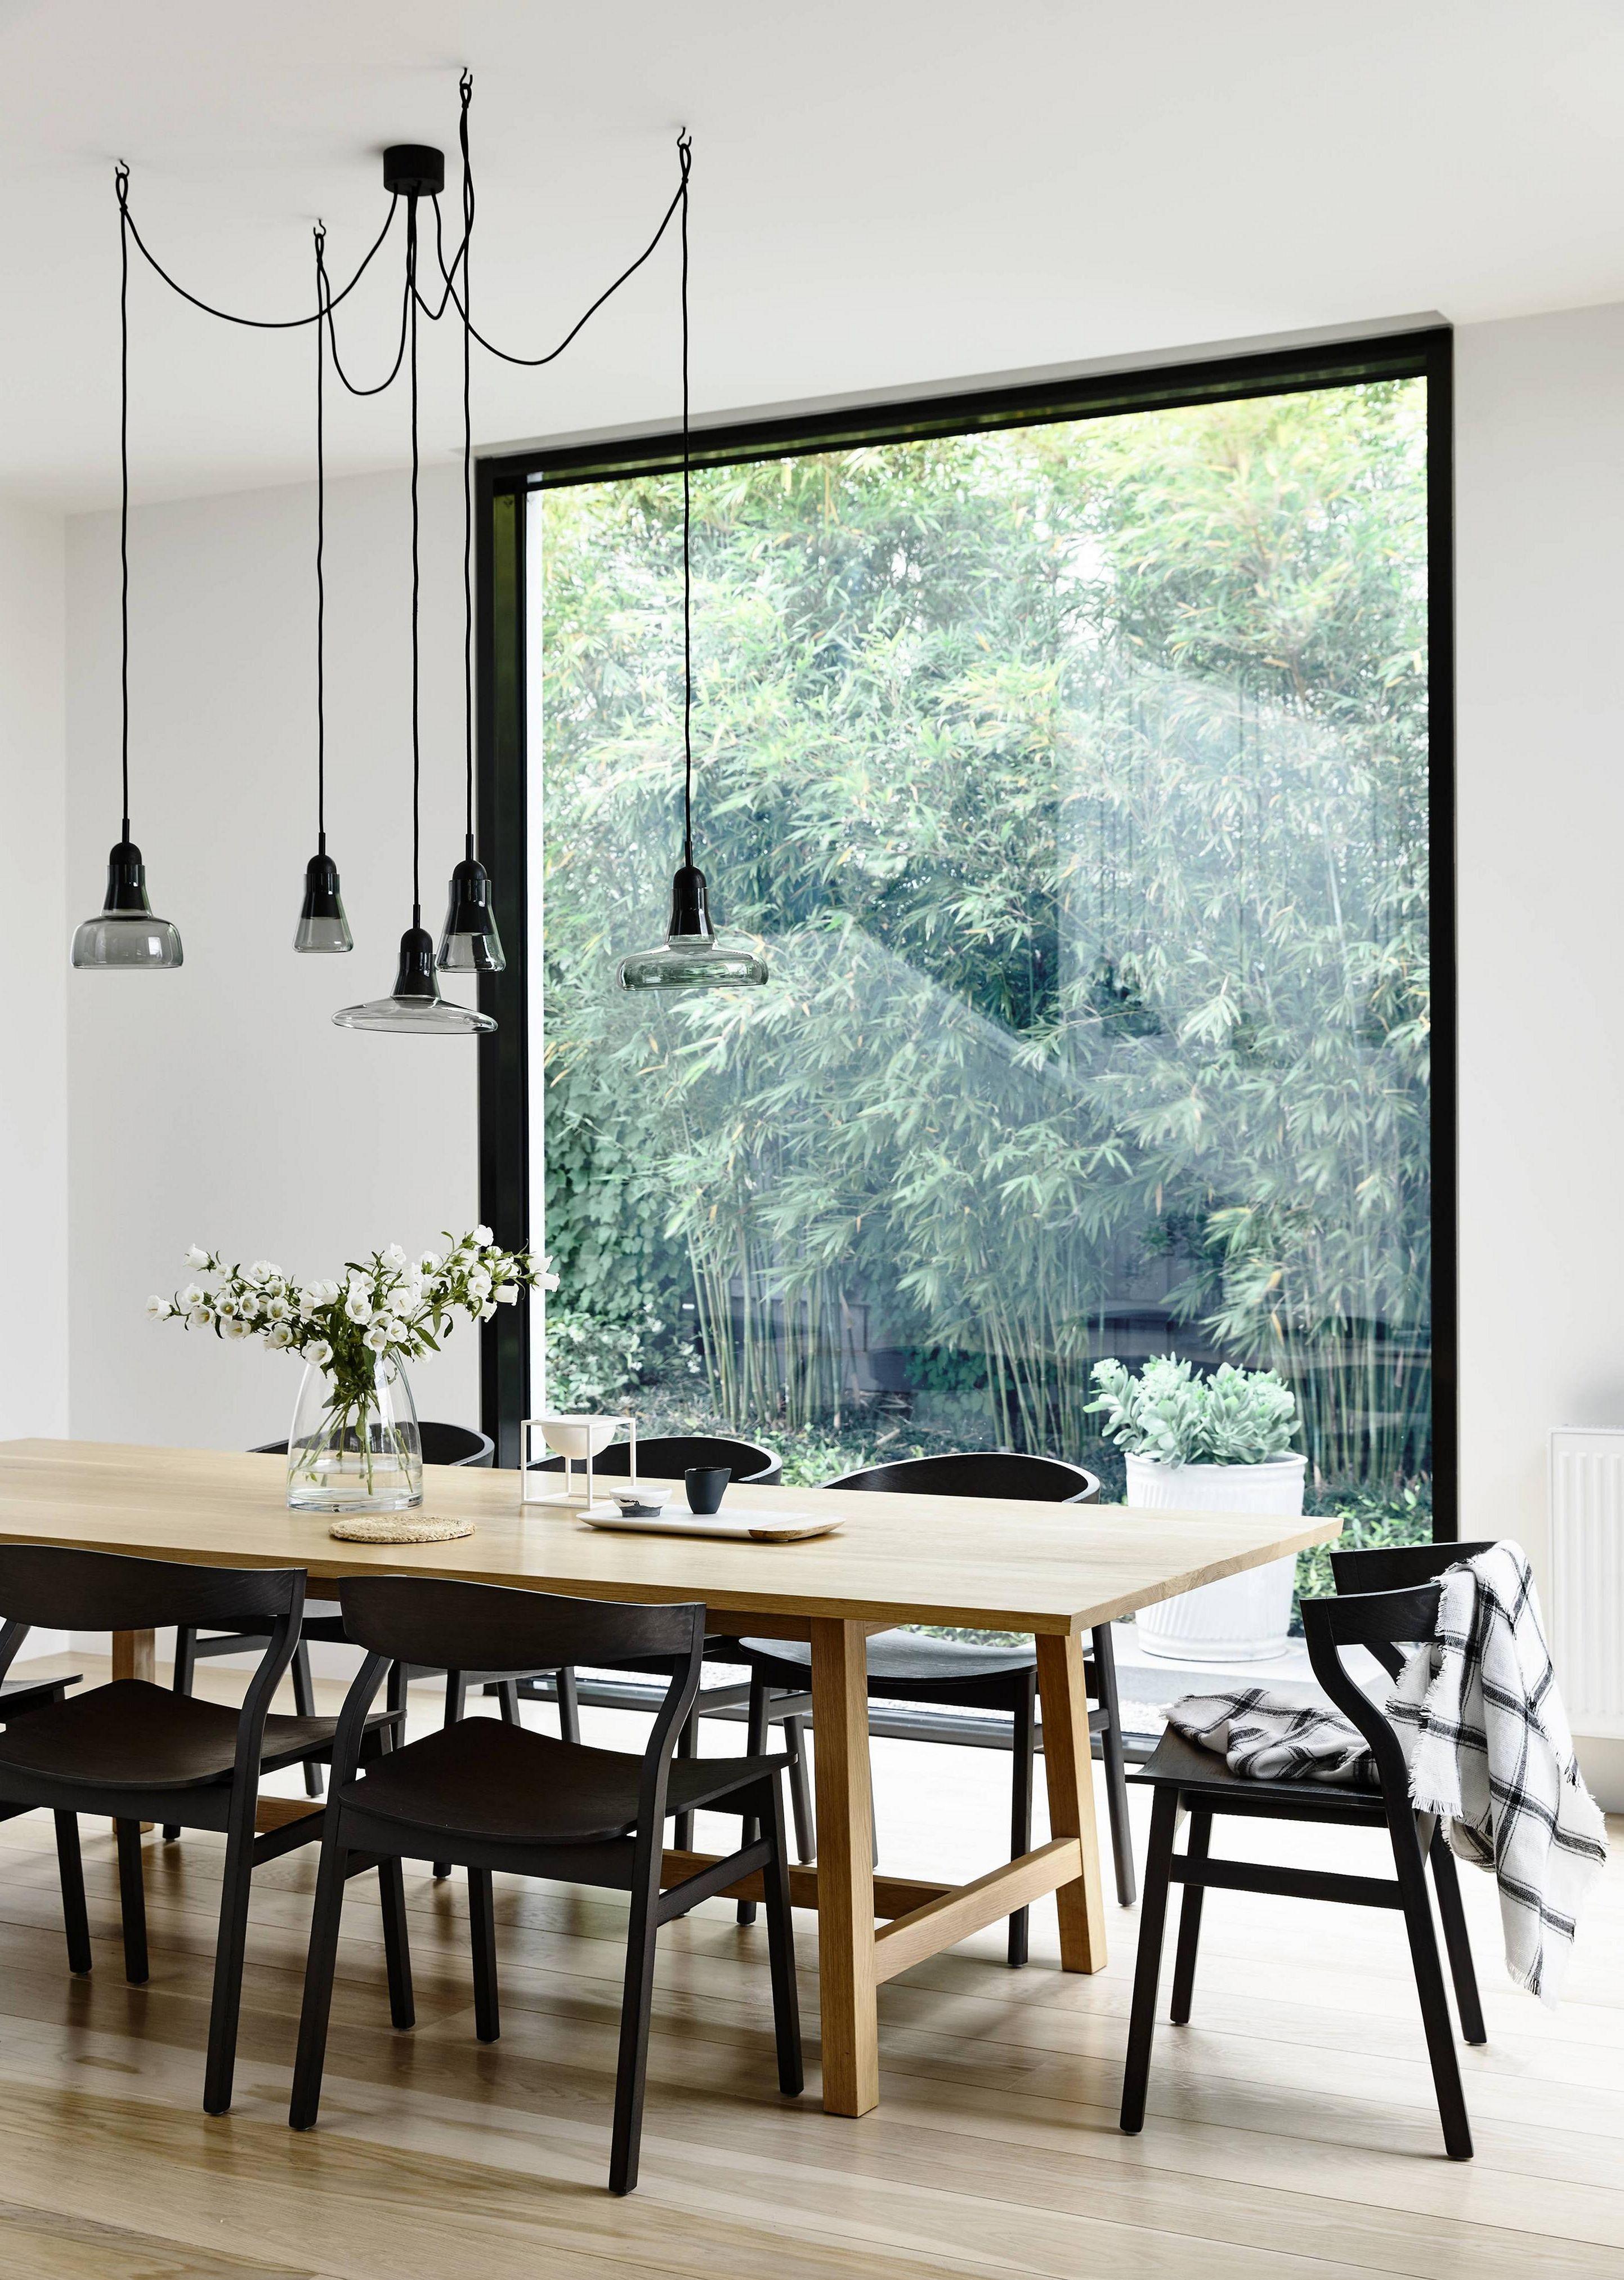 50 Simple Scandinavian Dining Room Ideas Decorating Ideas Home Decor Ideas And Tips Scandinavian Dining Room Dining Room Inspiration Decor